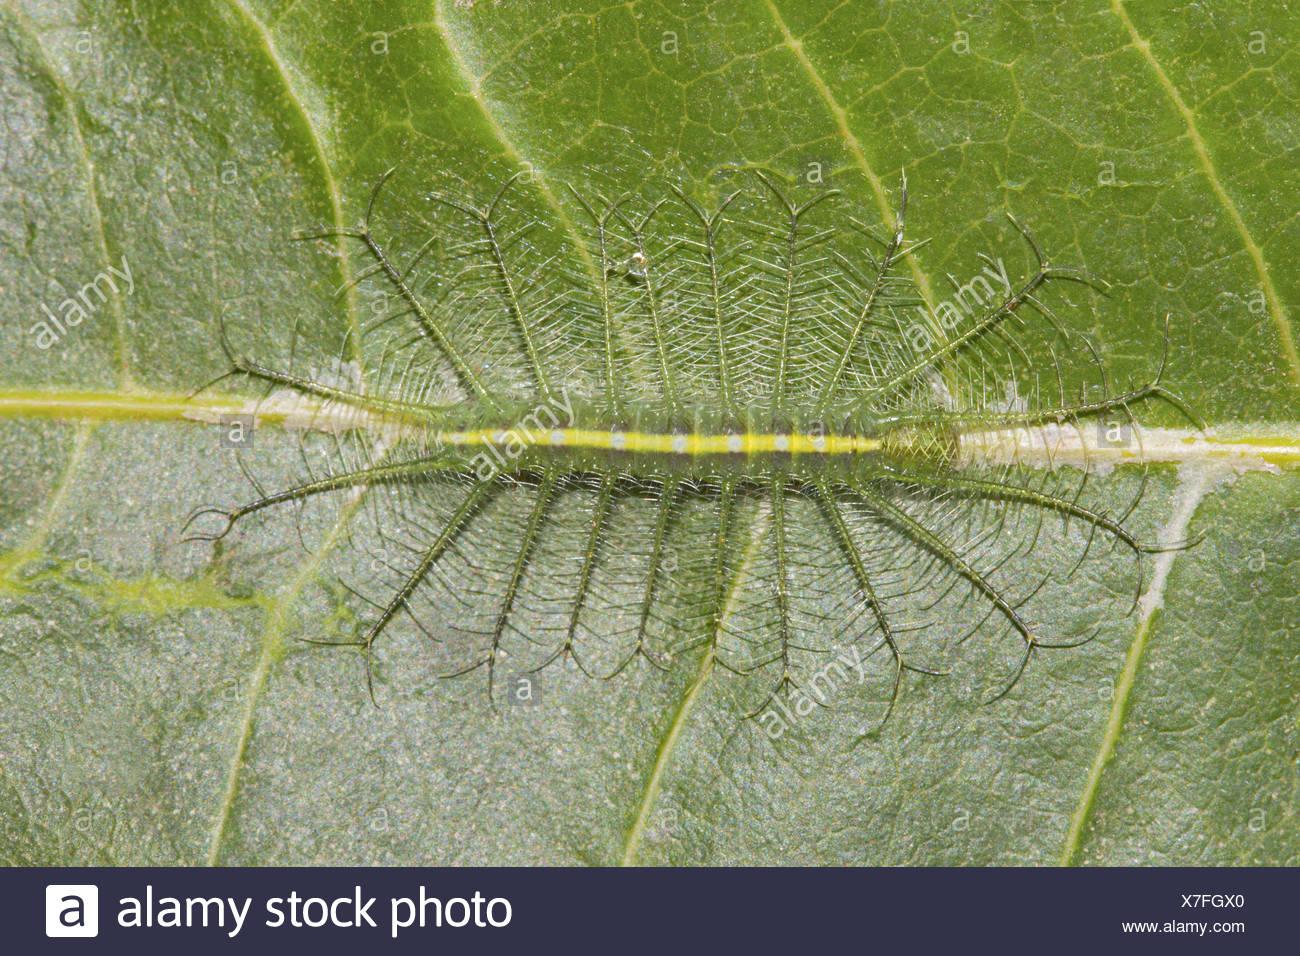 COMMON BARON Euthalia aconthea Caterpillar Bangalore, INDIA